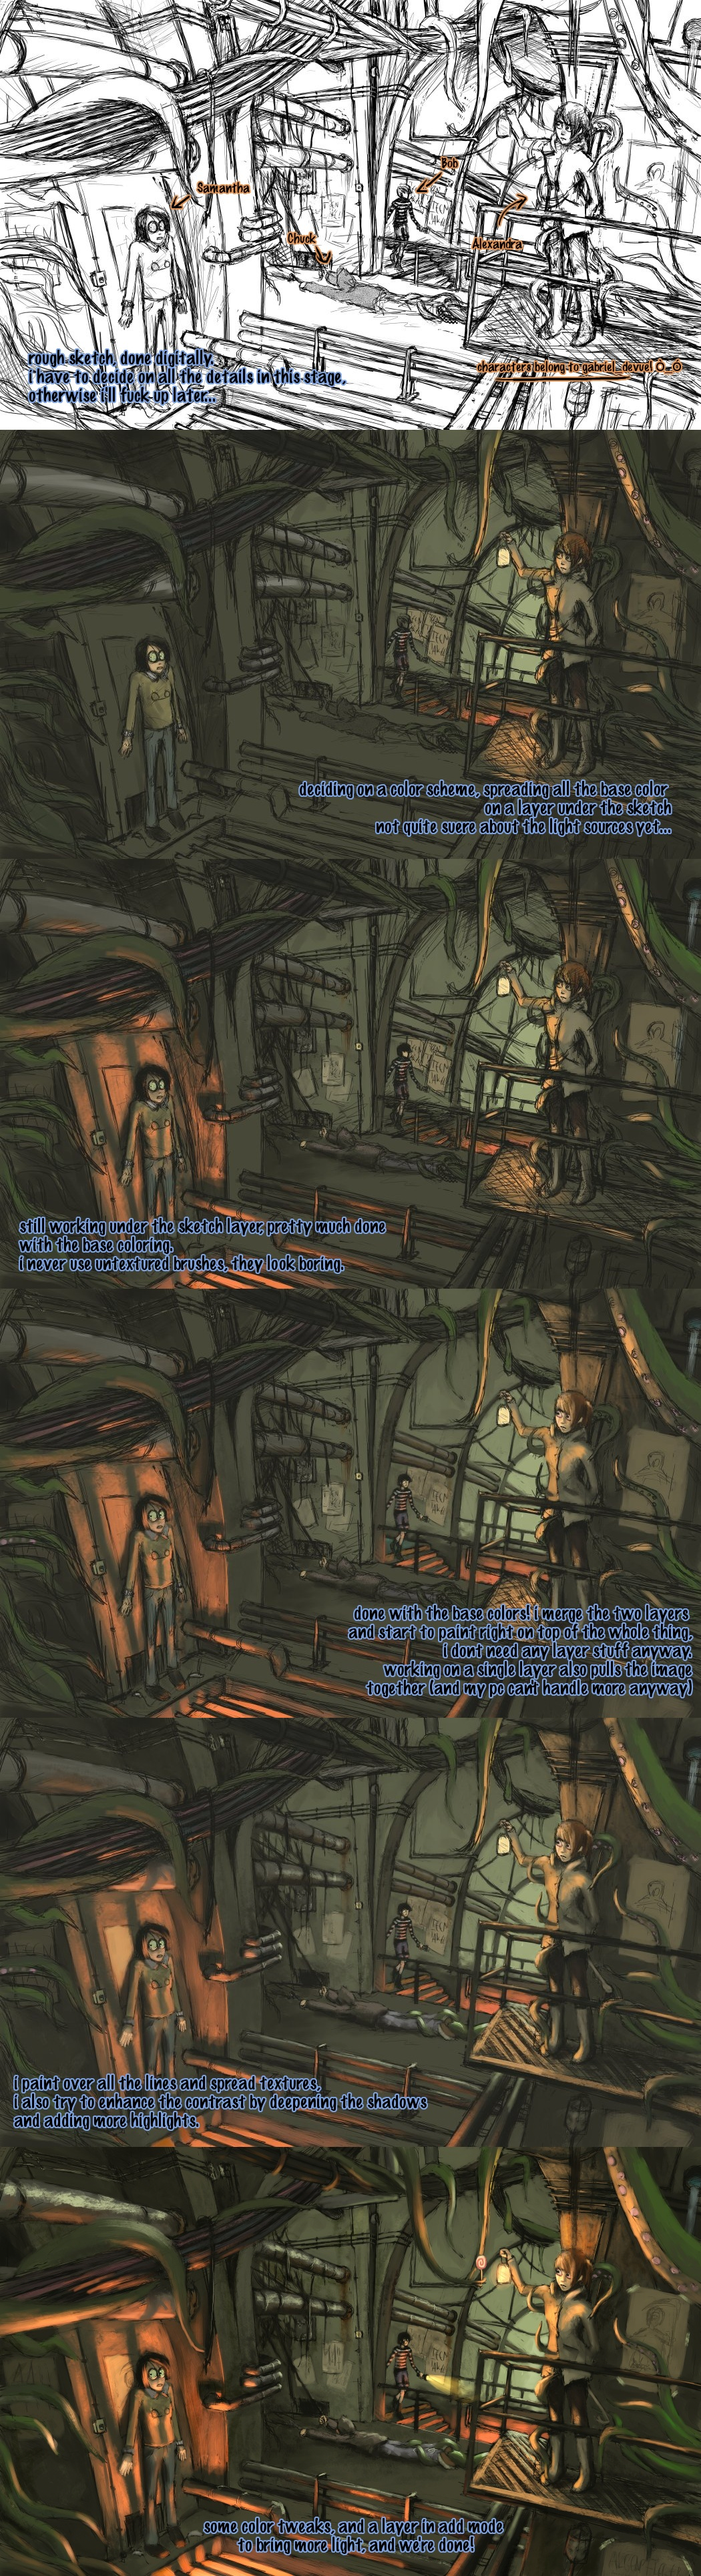 Fanart of Doom - Steps by algenpfleger